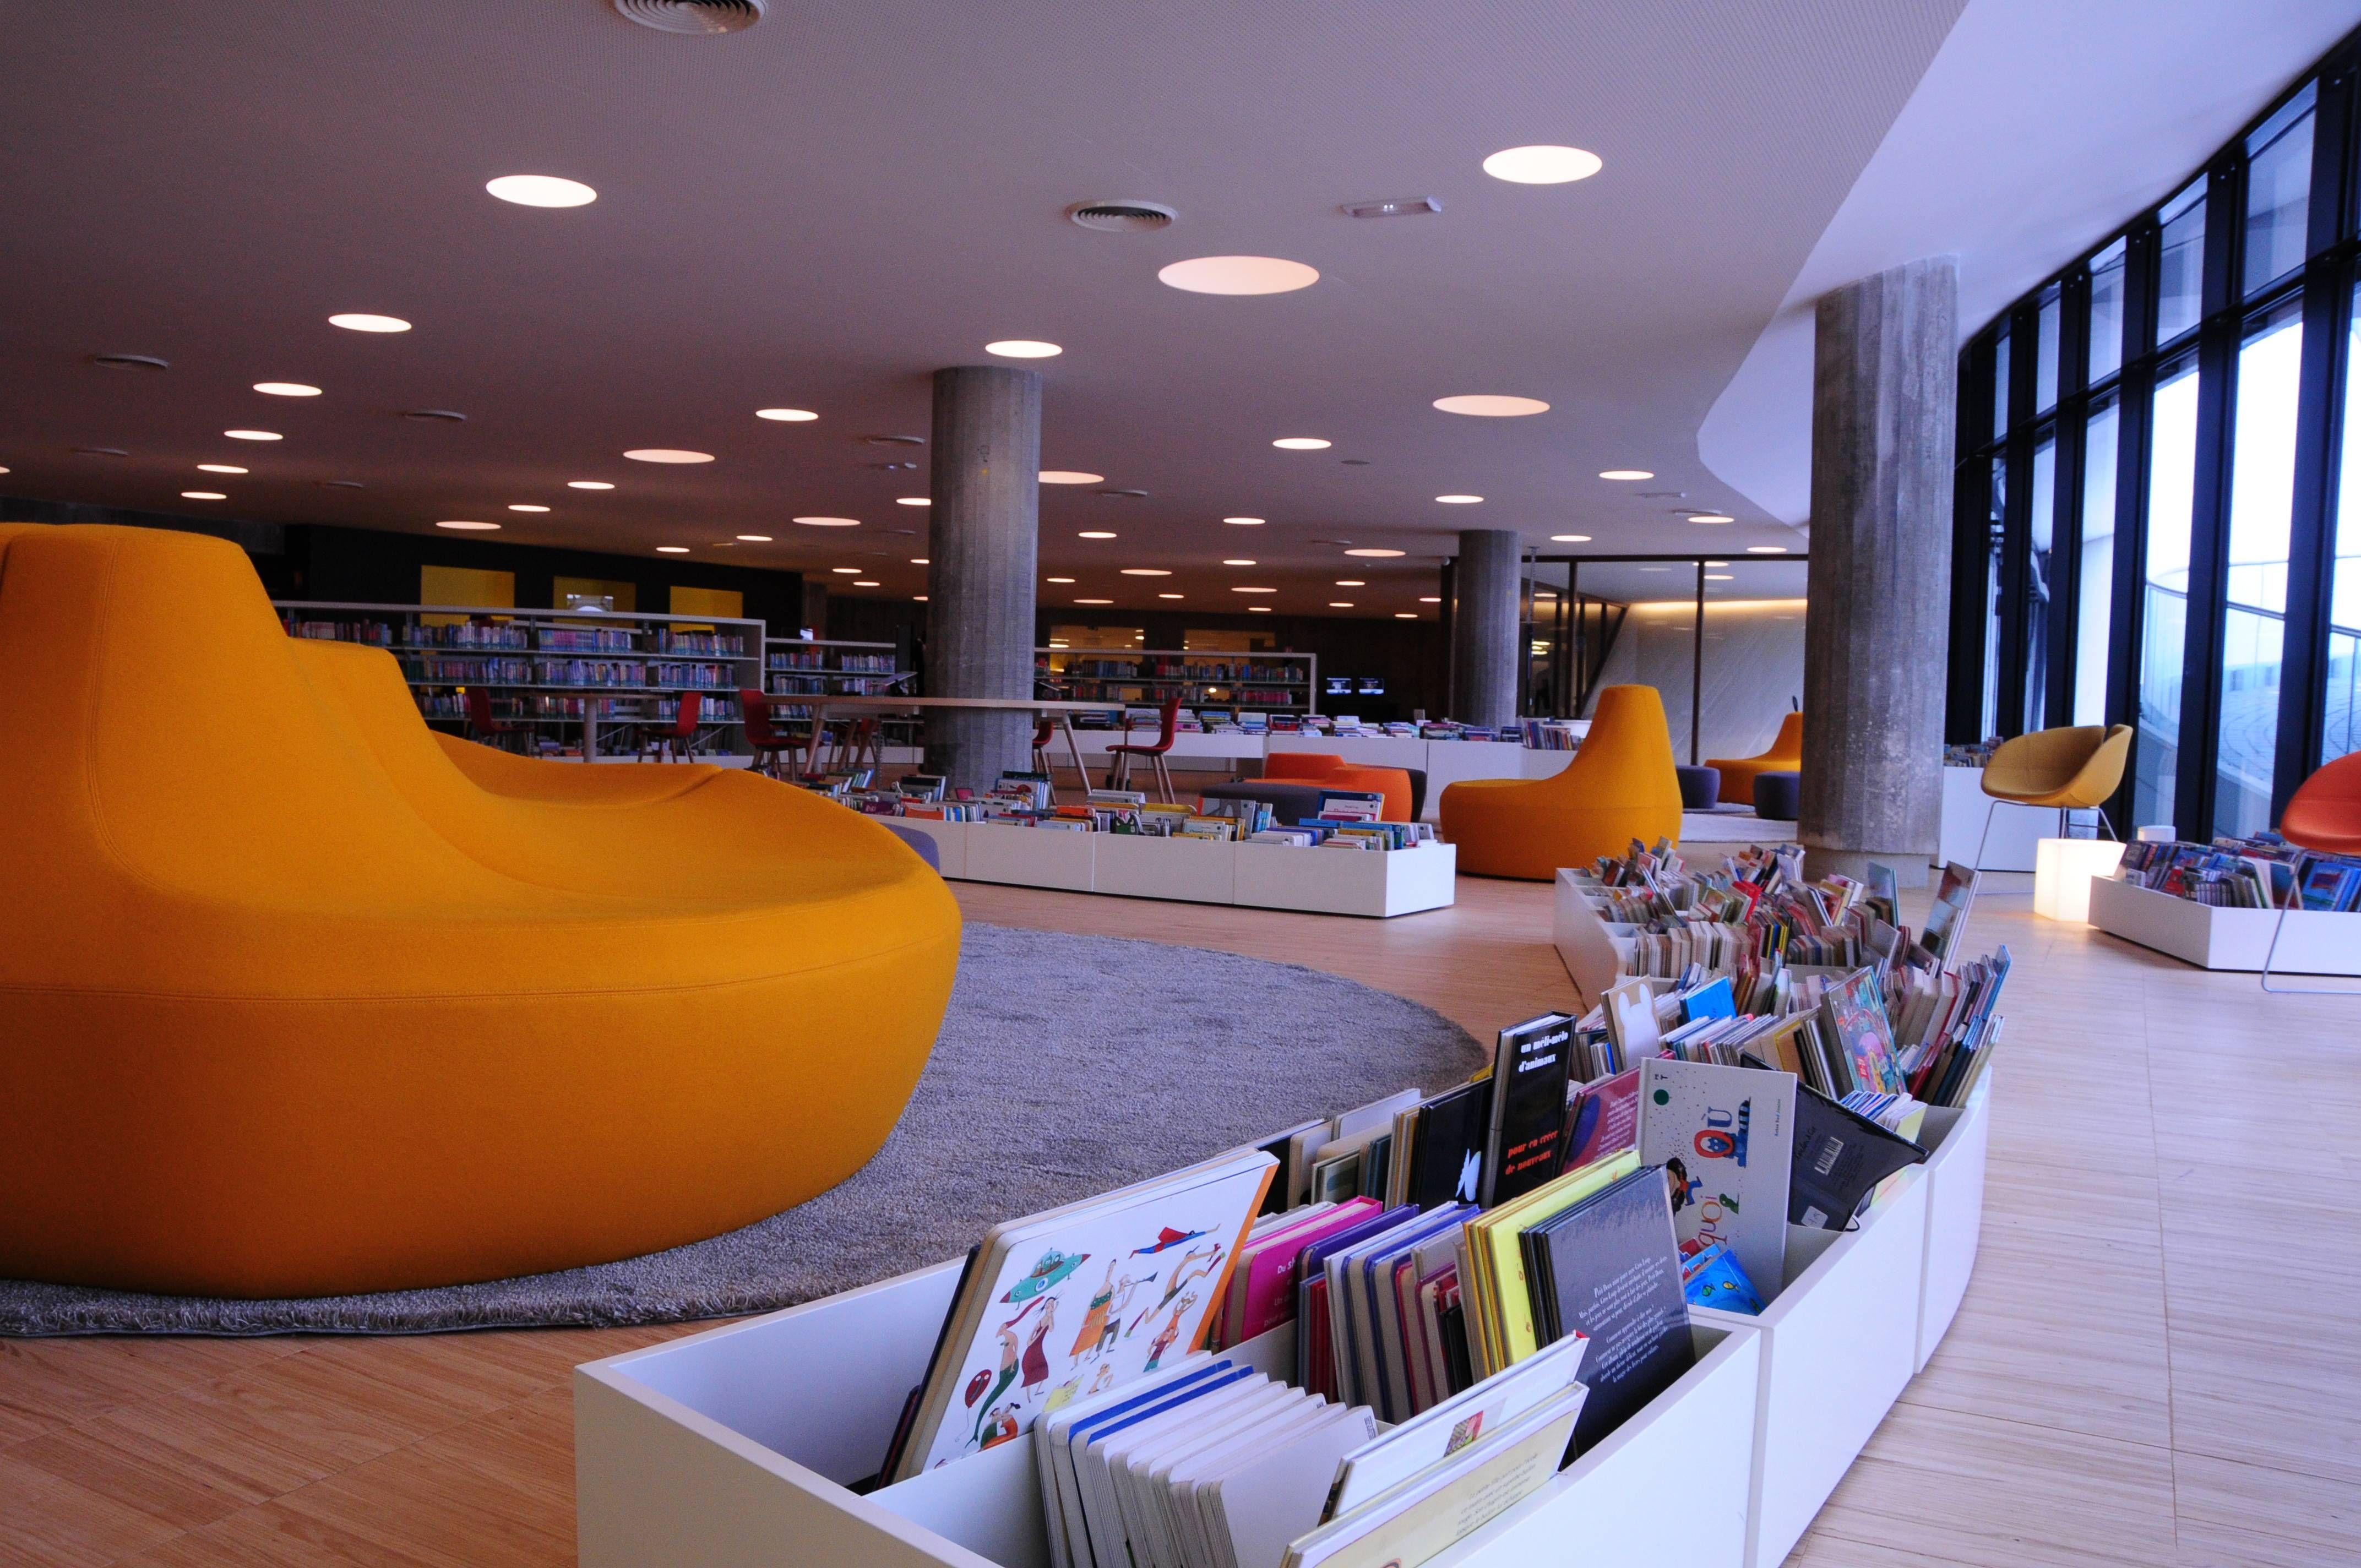 biblioth que oscar niemeyer le volcan le havre r hab deshouli res biblioth ques. Black Bedroom Furniture Sets. Home Design Ideas